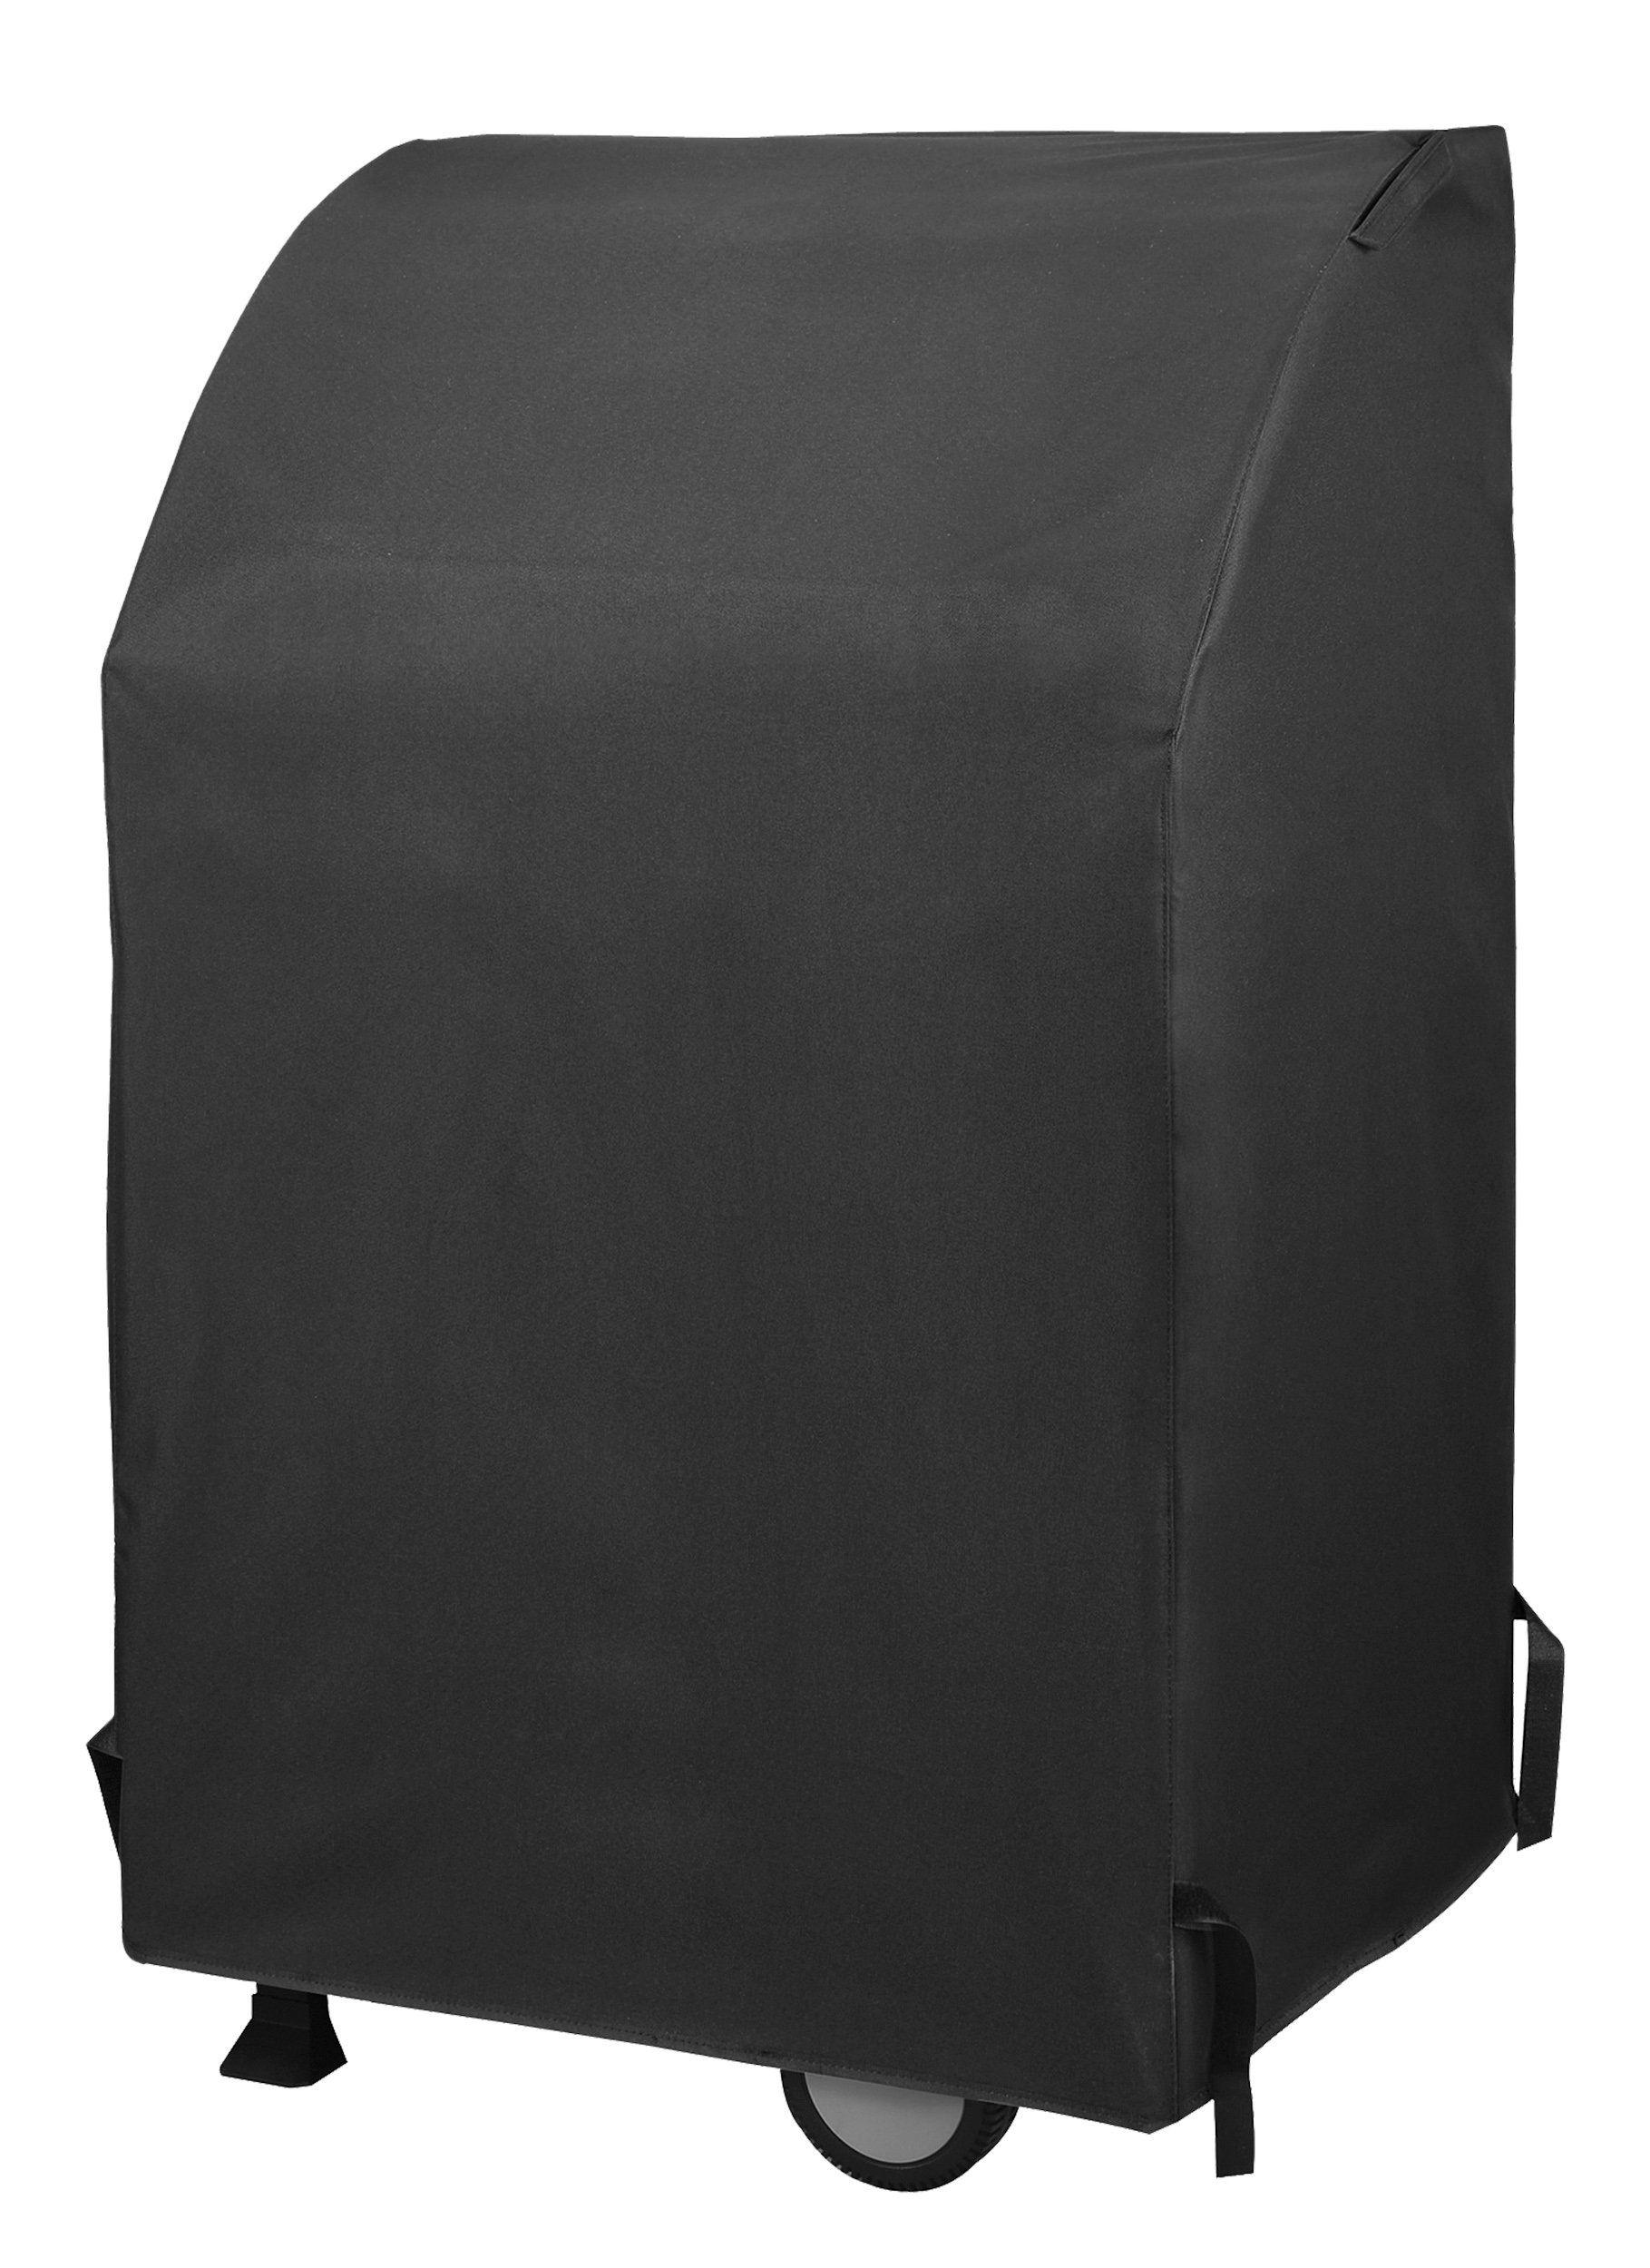 Unicook Heavy Duty Waterproof 2 Burner Gas Grill Cover 32 Inch